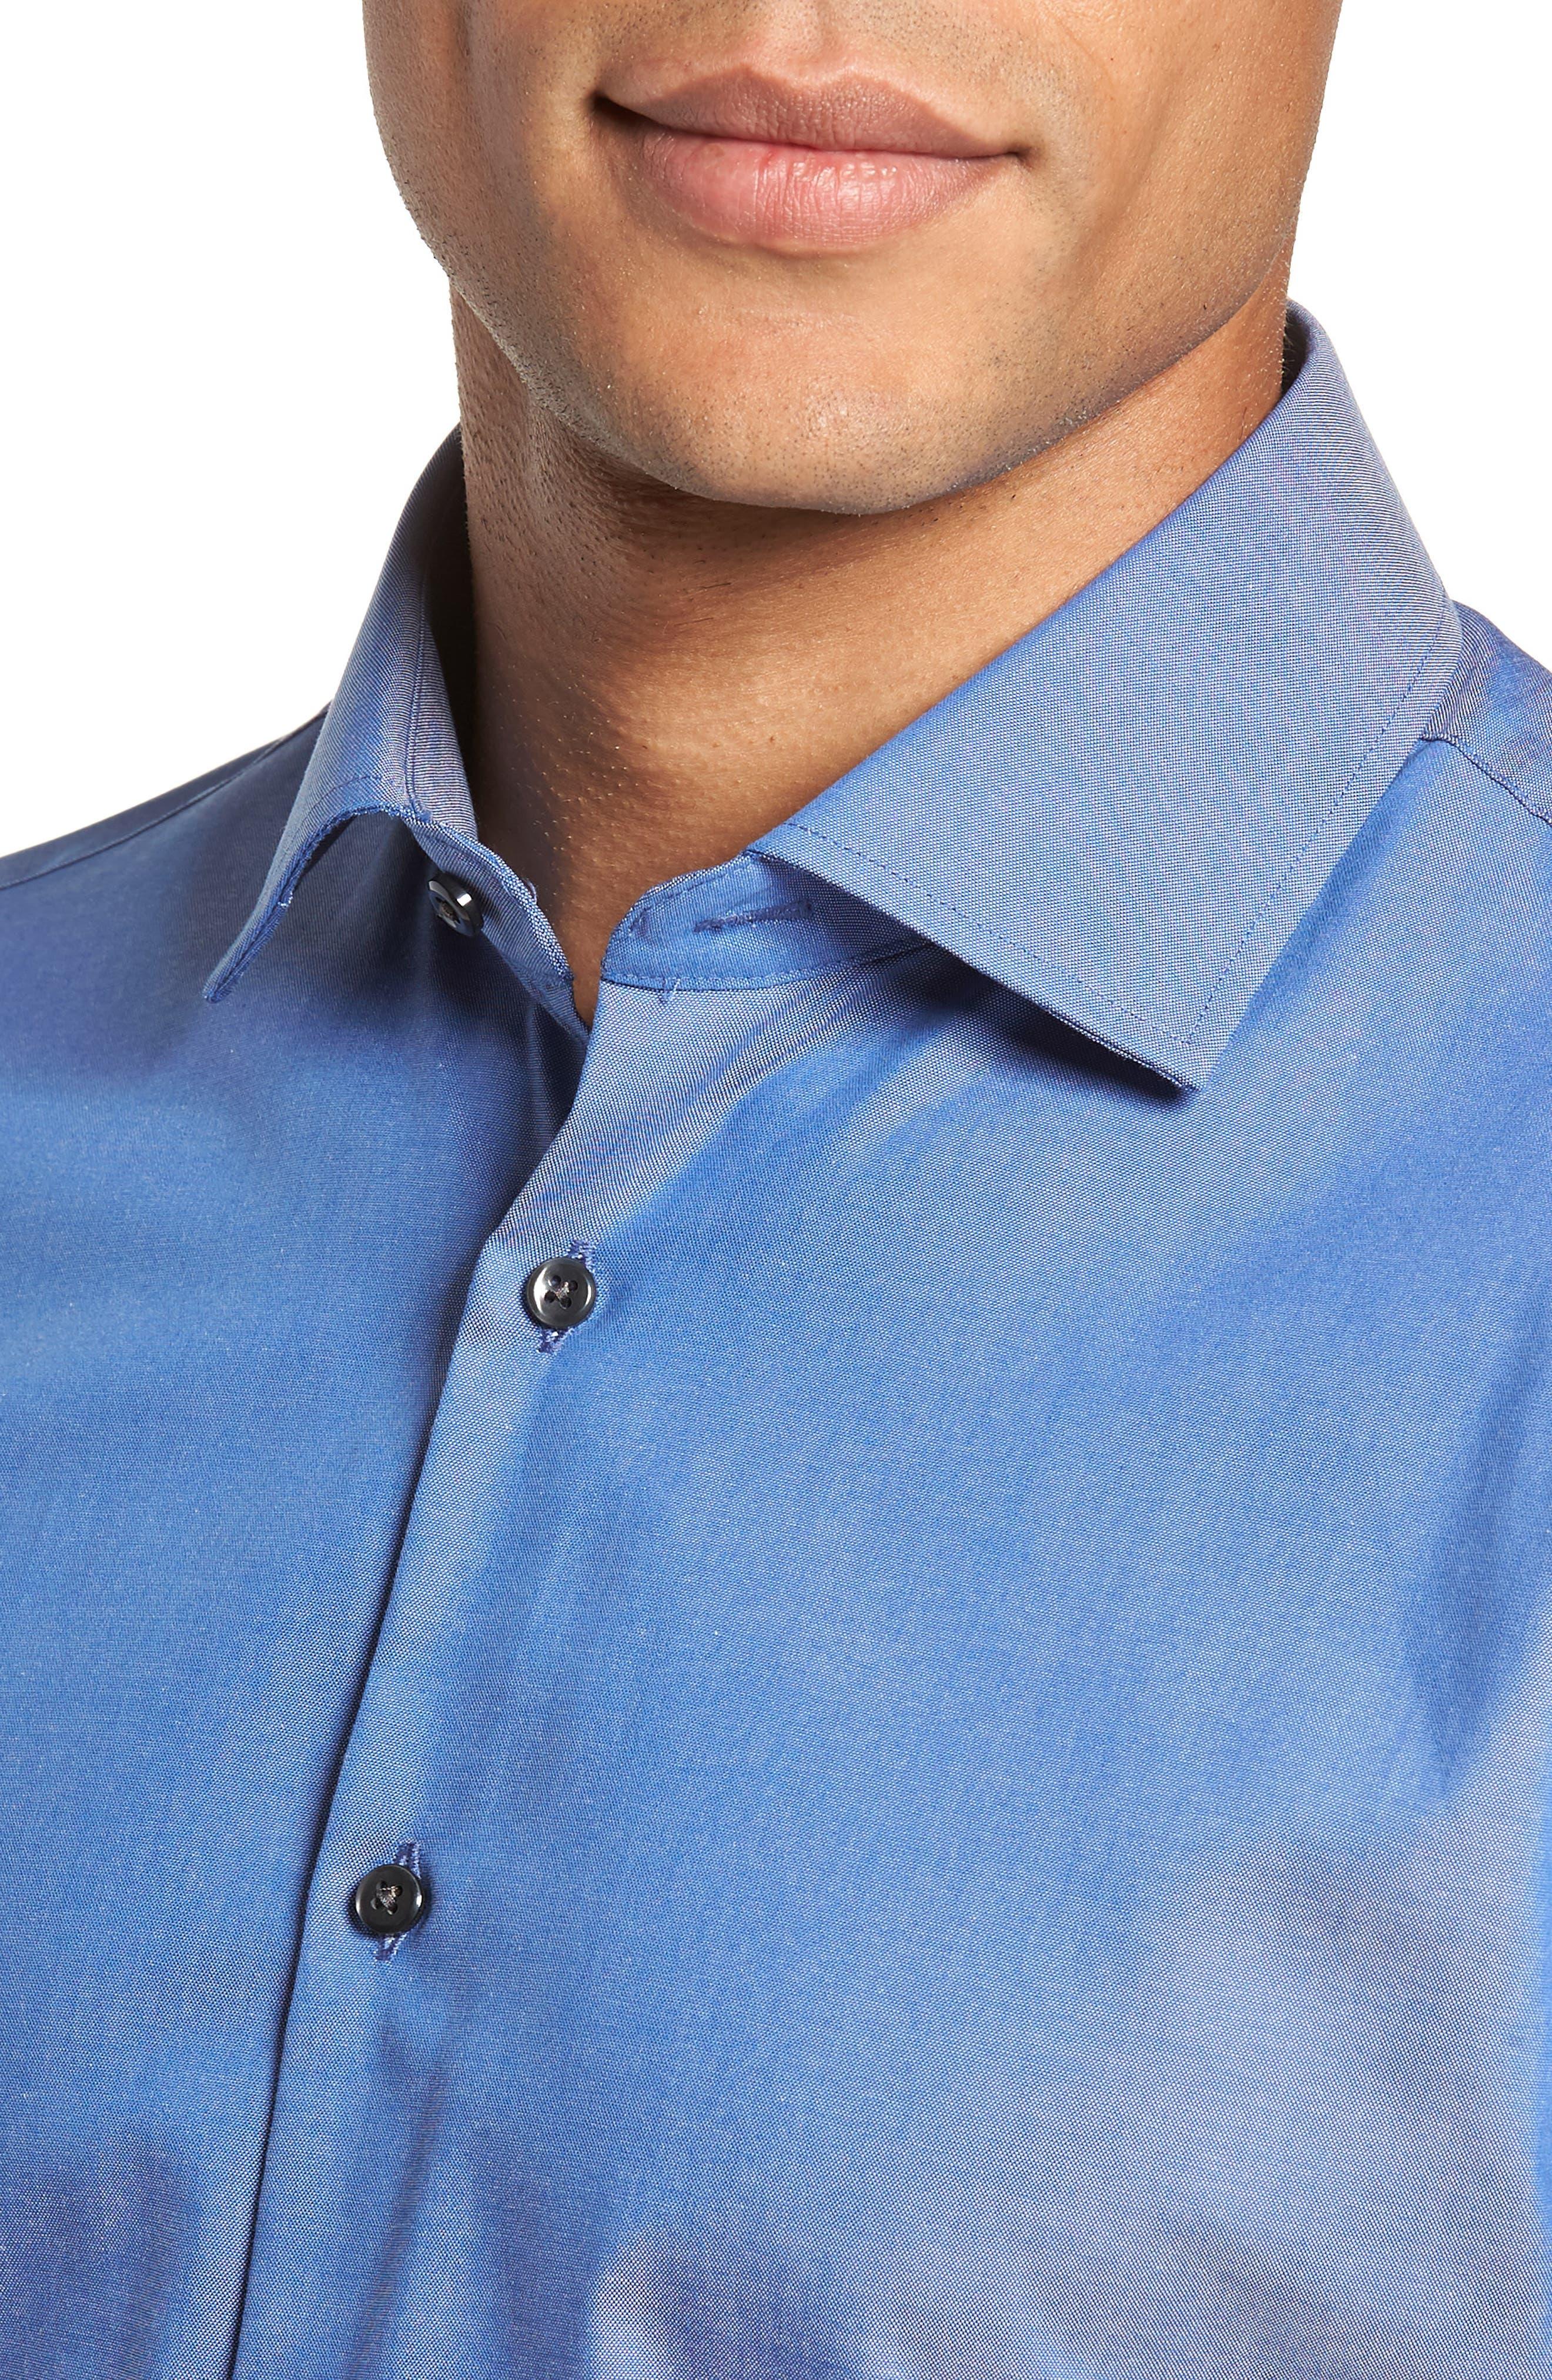 Extra Trim Fit Non-Iron Solid Dress Shirt,                             Alternate thumbnail 2, color,                             BLUE DENIM